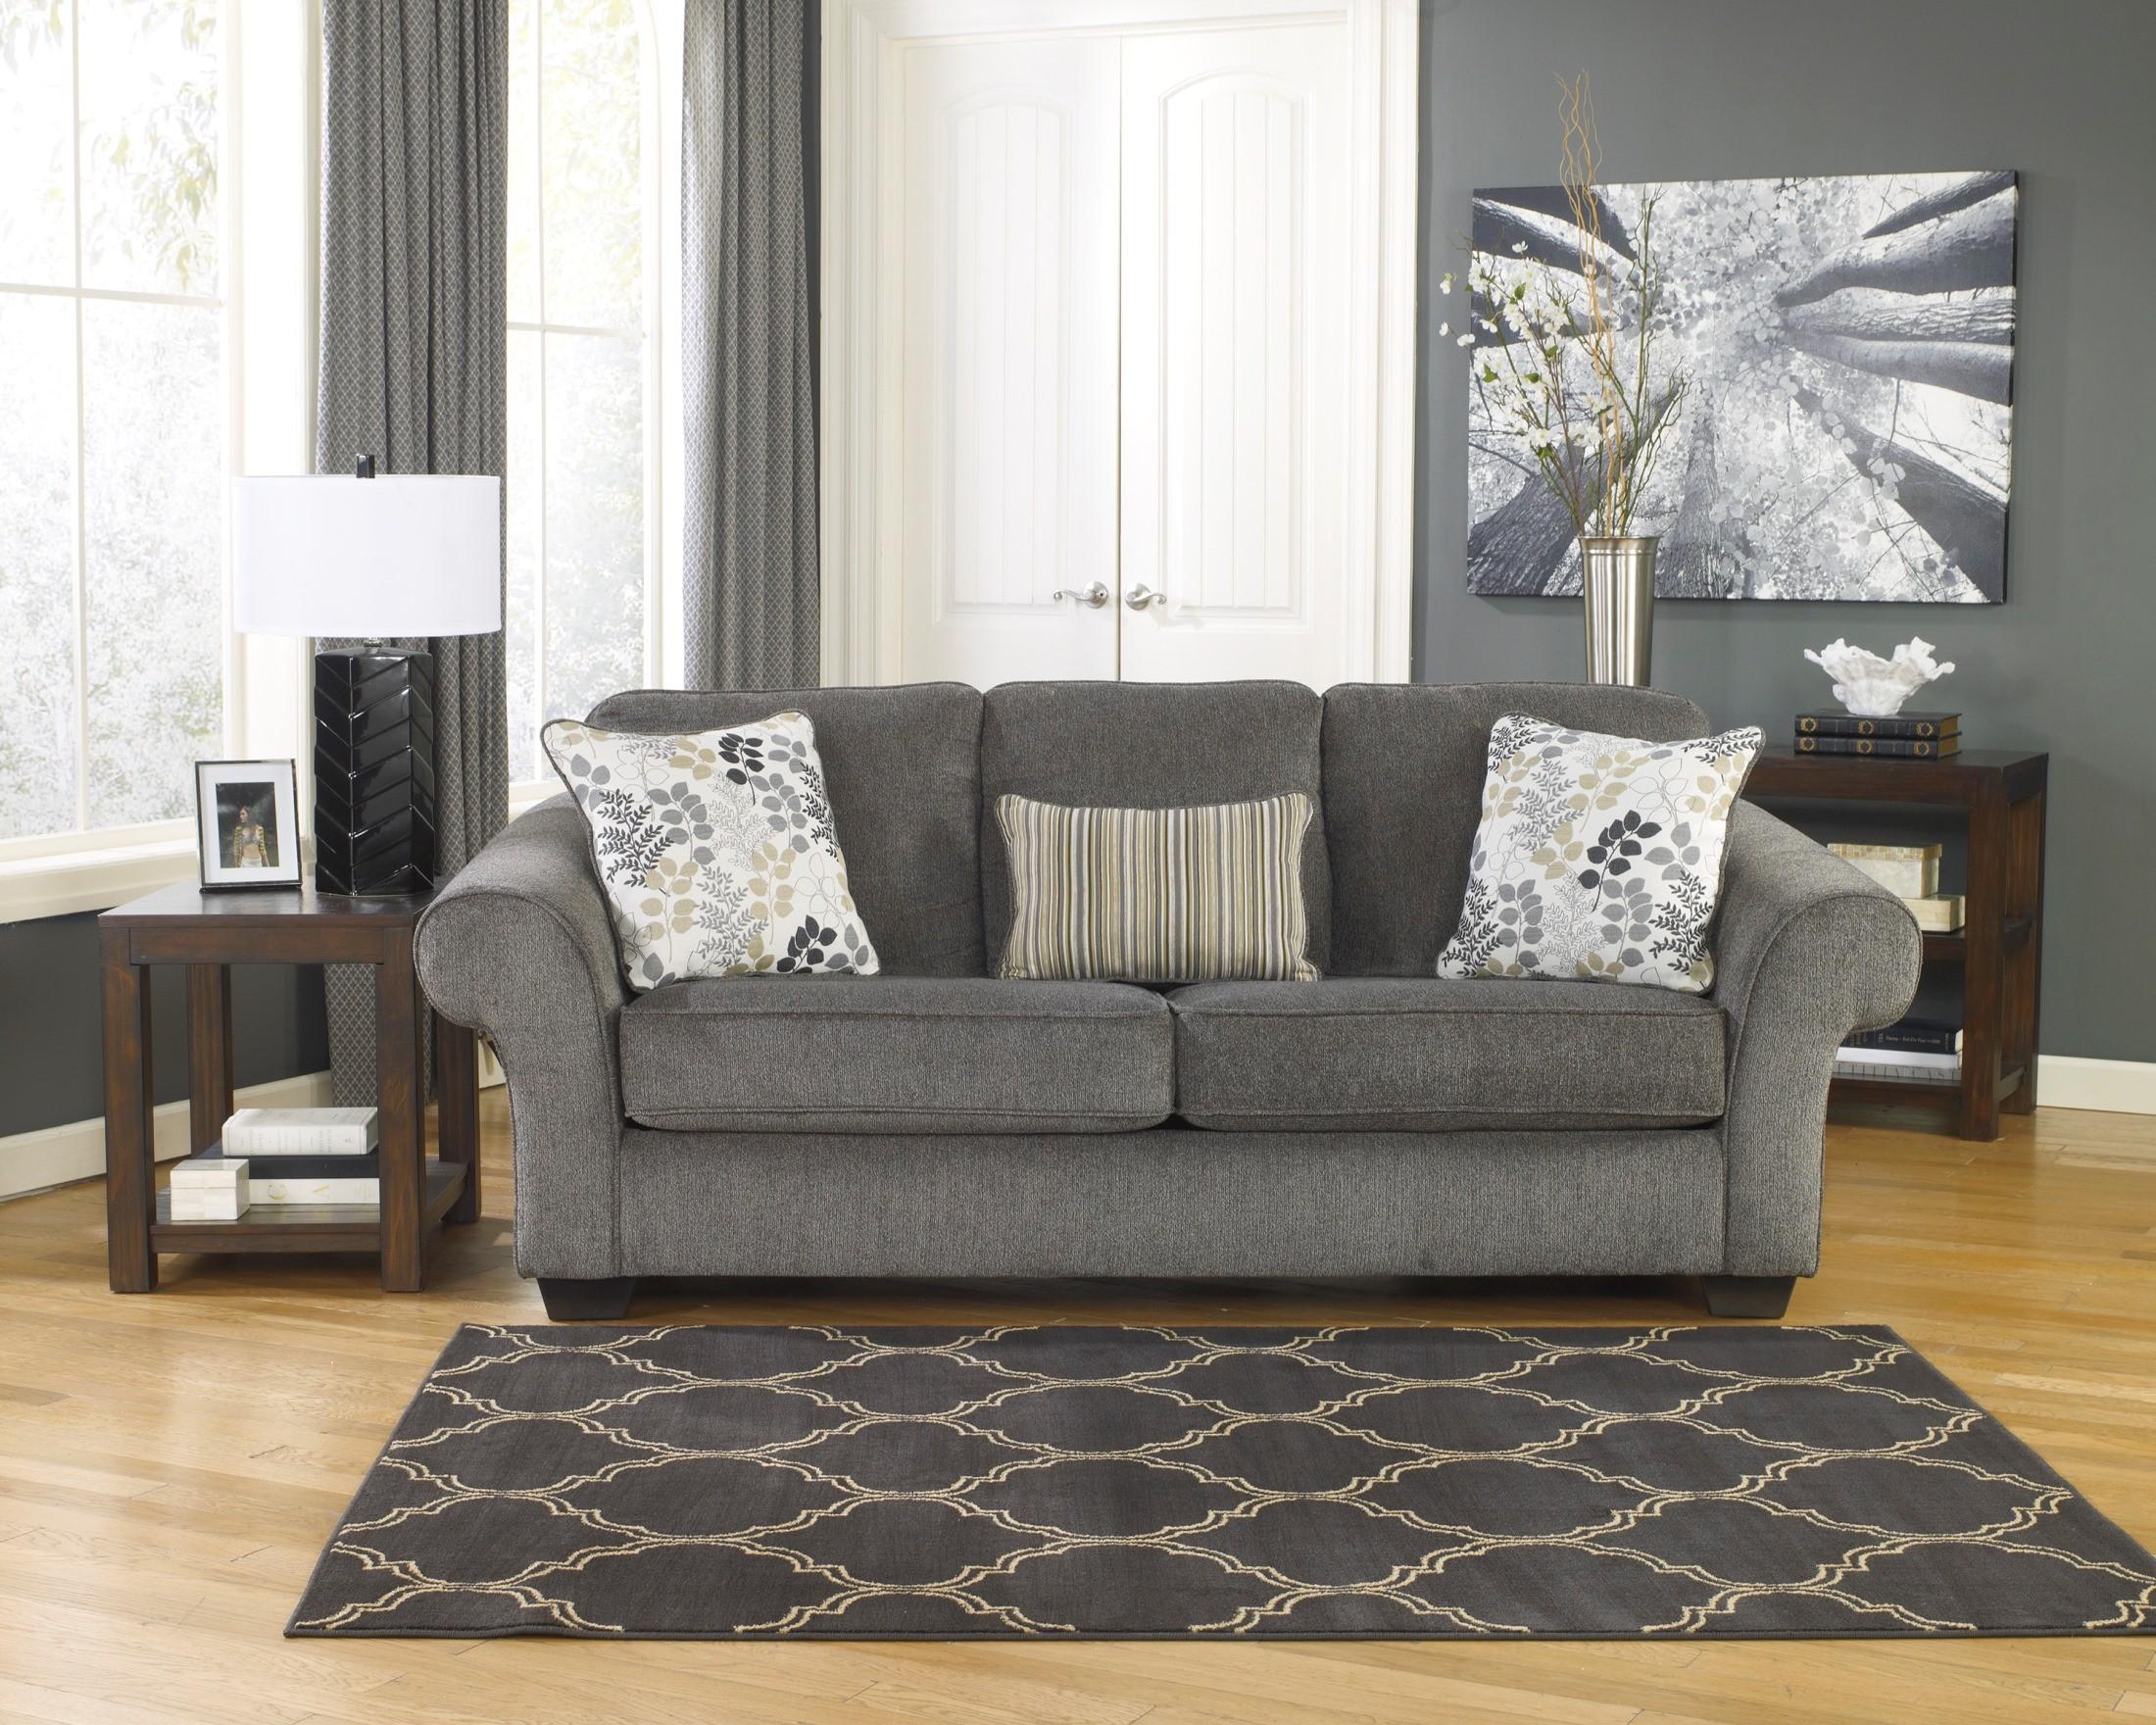 Makonnen Charcoal Queen Sofa Sleeper from Ashley